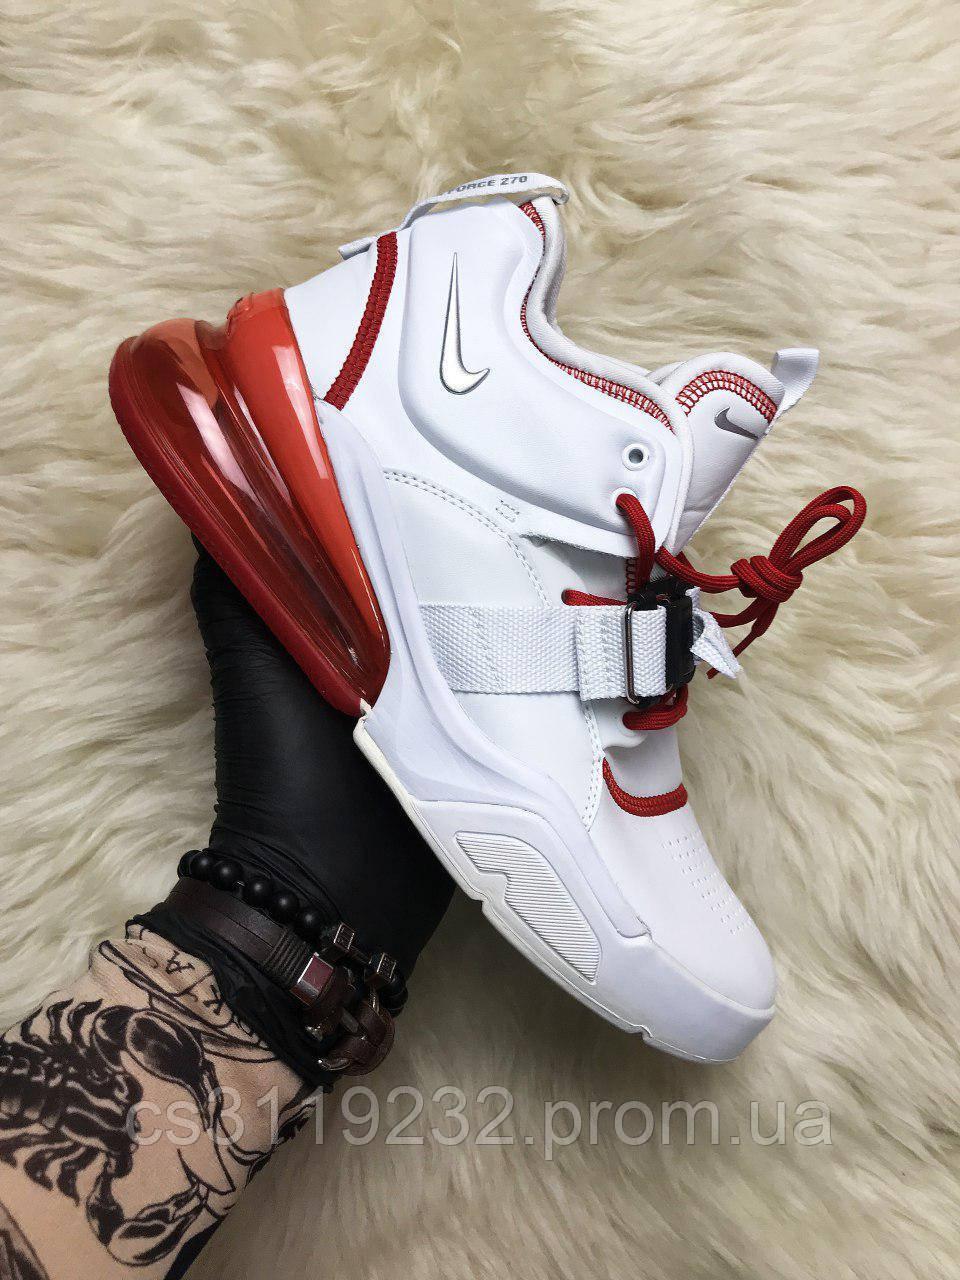 Мужские кроссовки Nike Air Force 270 White Red (белые)